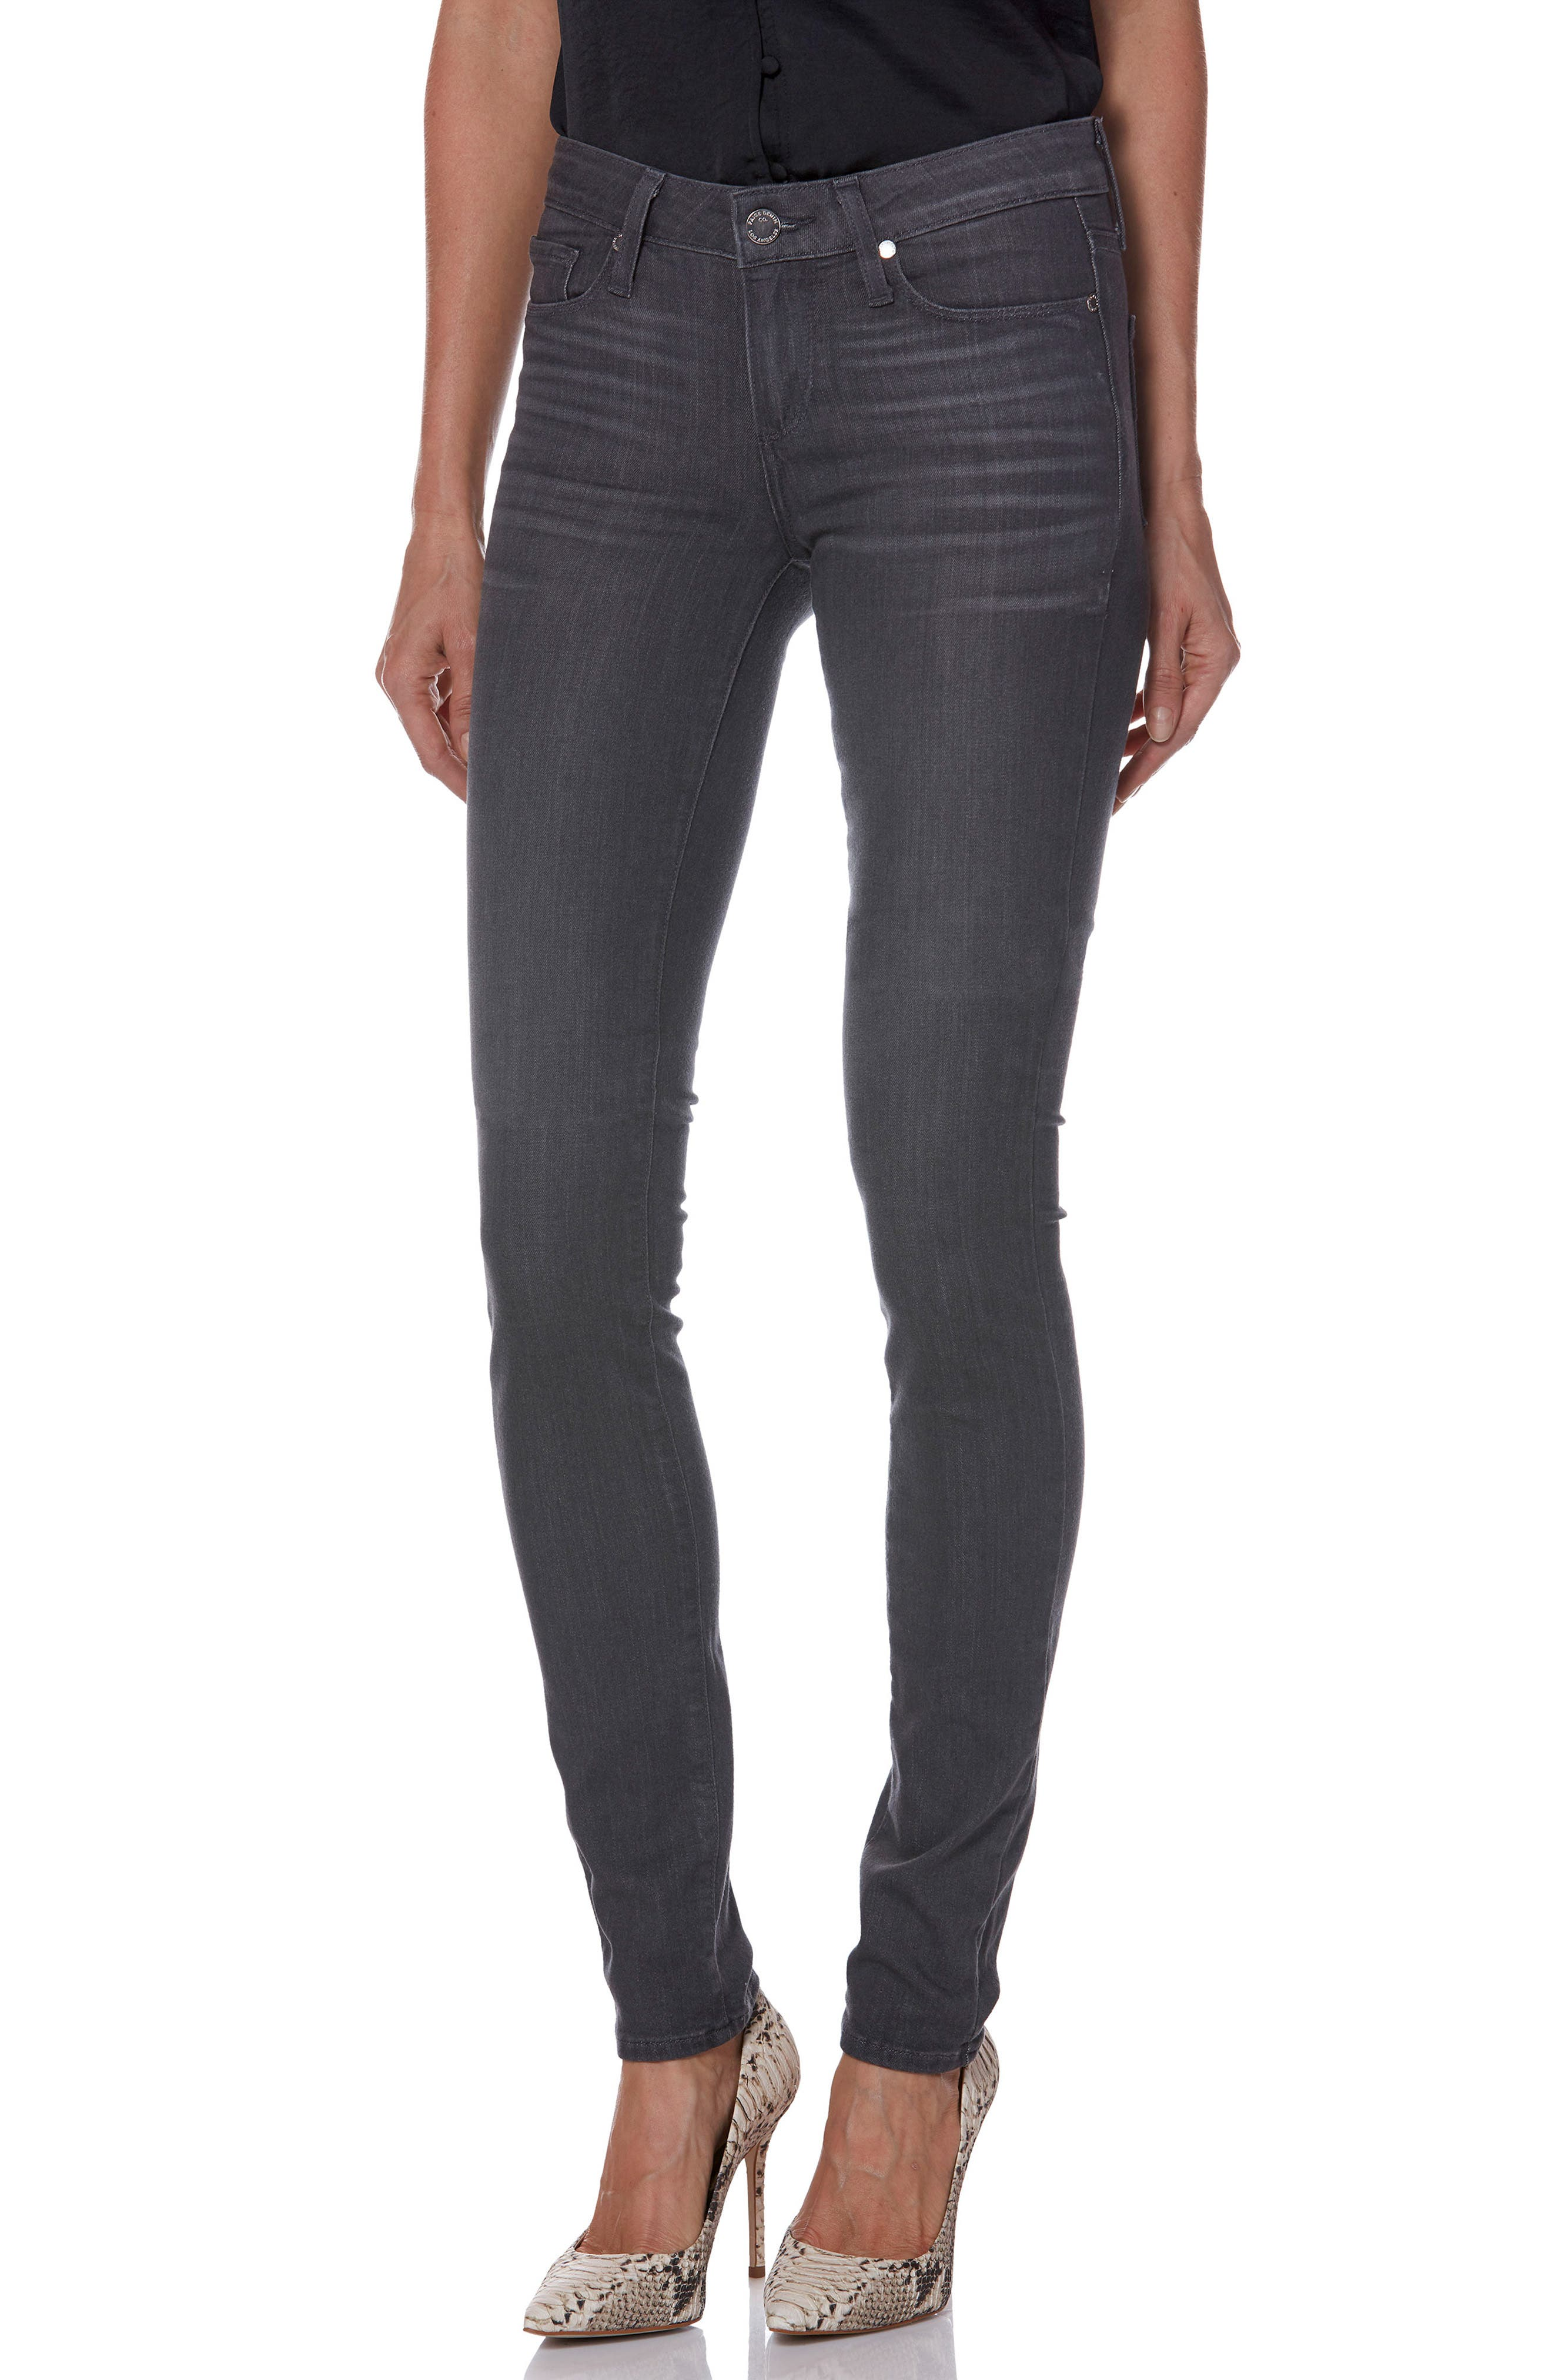 Transcend - Leggy Ultra Skinny Jeans,                             Main thumbnail 1, color,                             GREY PEAKS